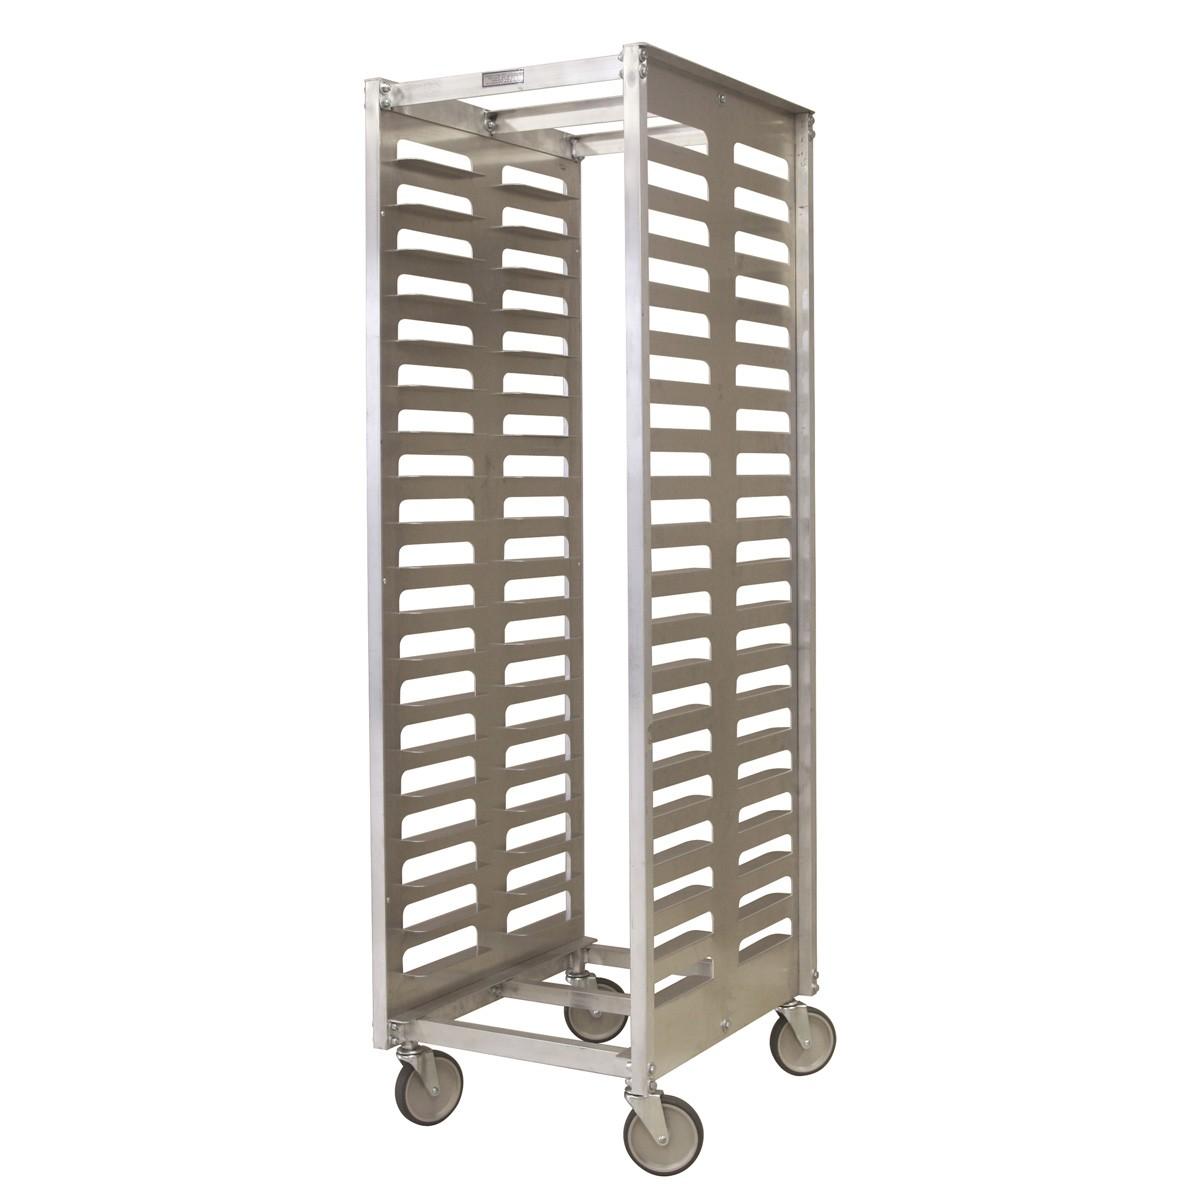 "Welded Food Tray Racks For Standard 18"" X 26"" Food"